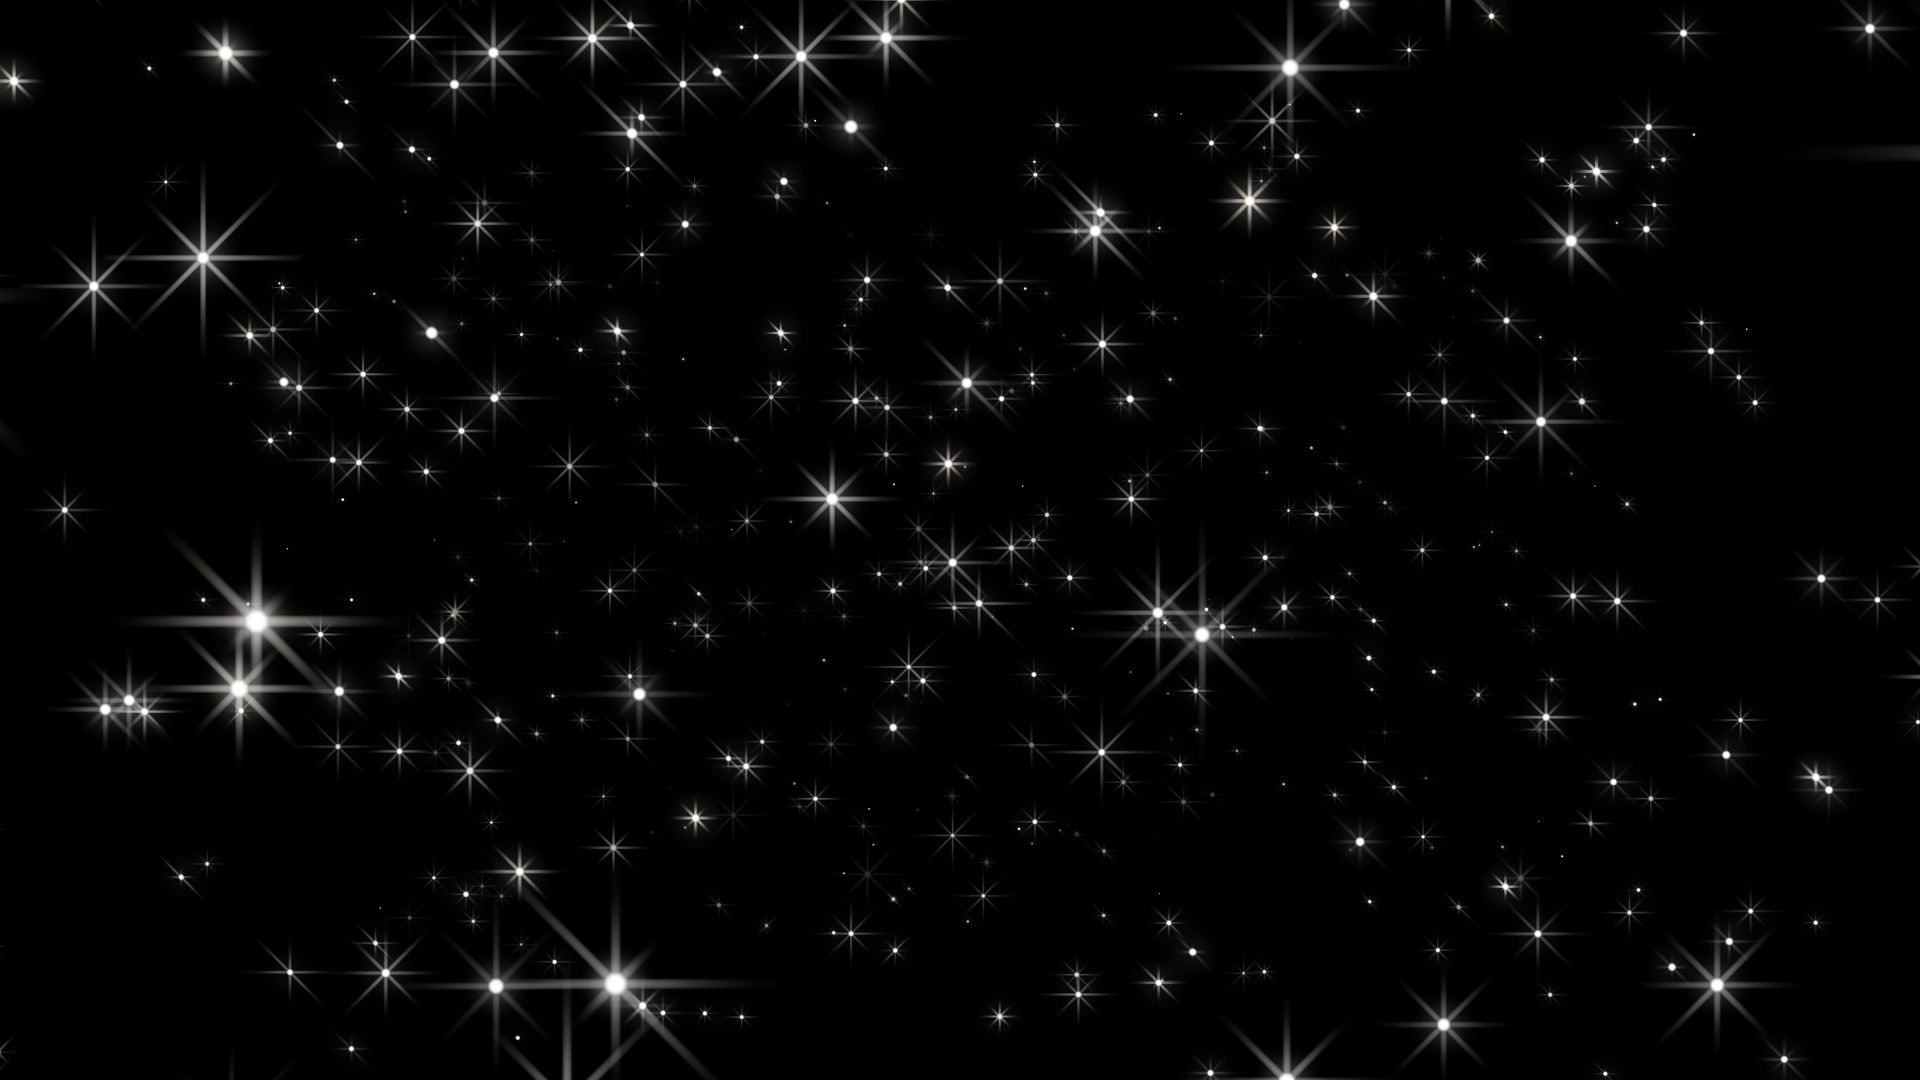 Starflight – Black Background